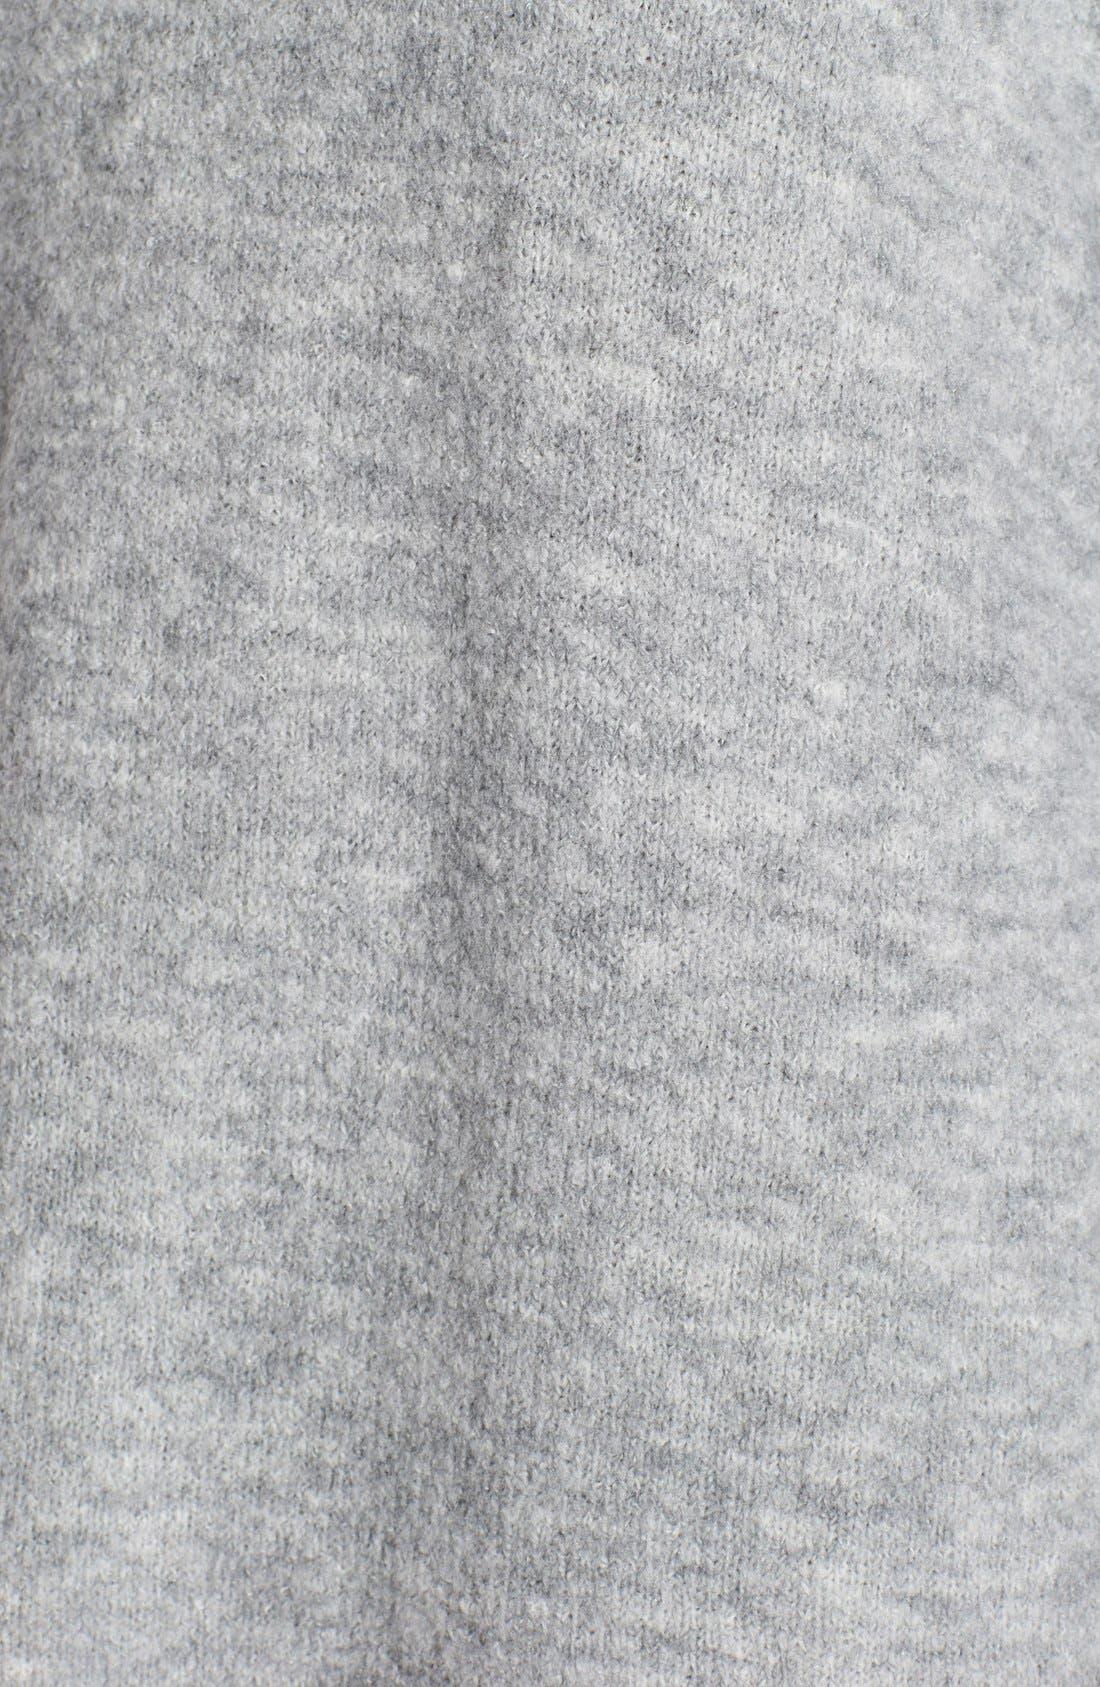 'Leighton' Turtleneck Sweater Dress,                             Alternate thumbnail 6, color,                             Grey